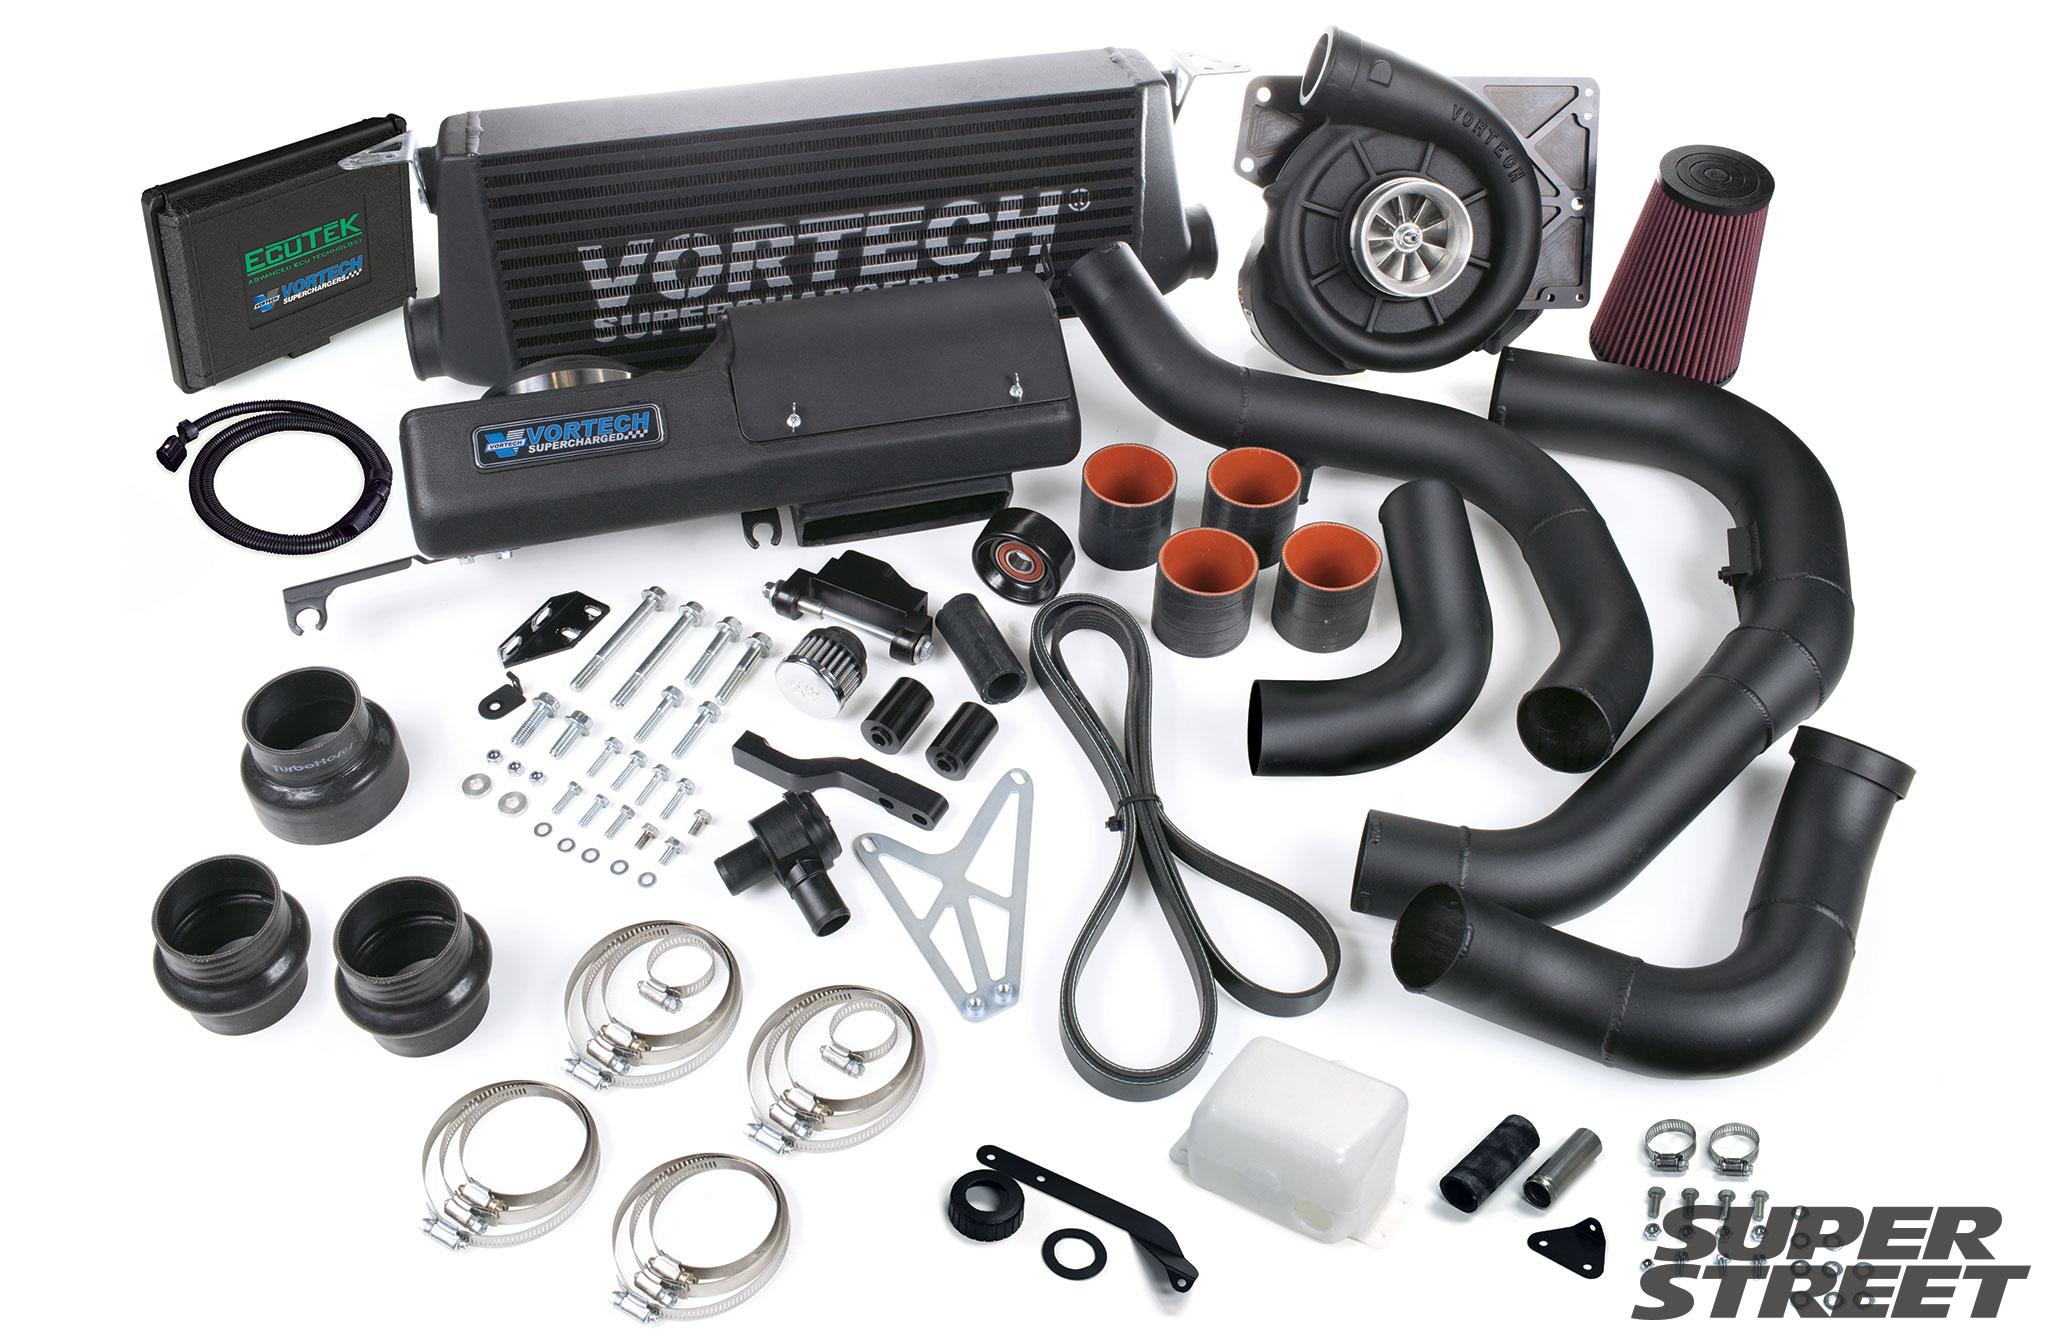 Scion Frs Parts >> Scion Fr S Subaru Brz Buyer S Guide 2014